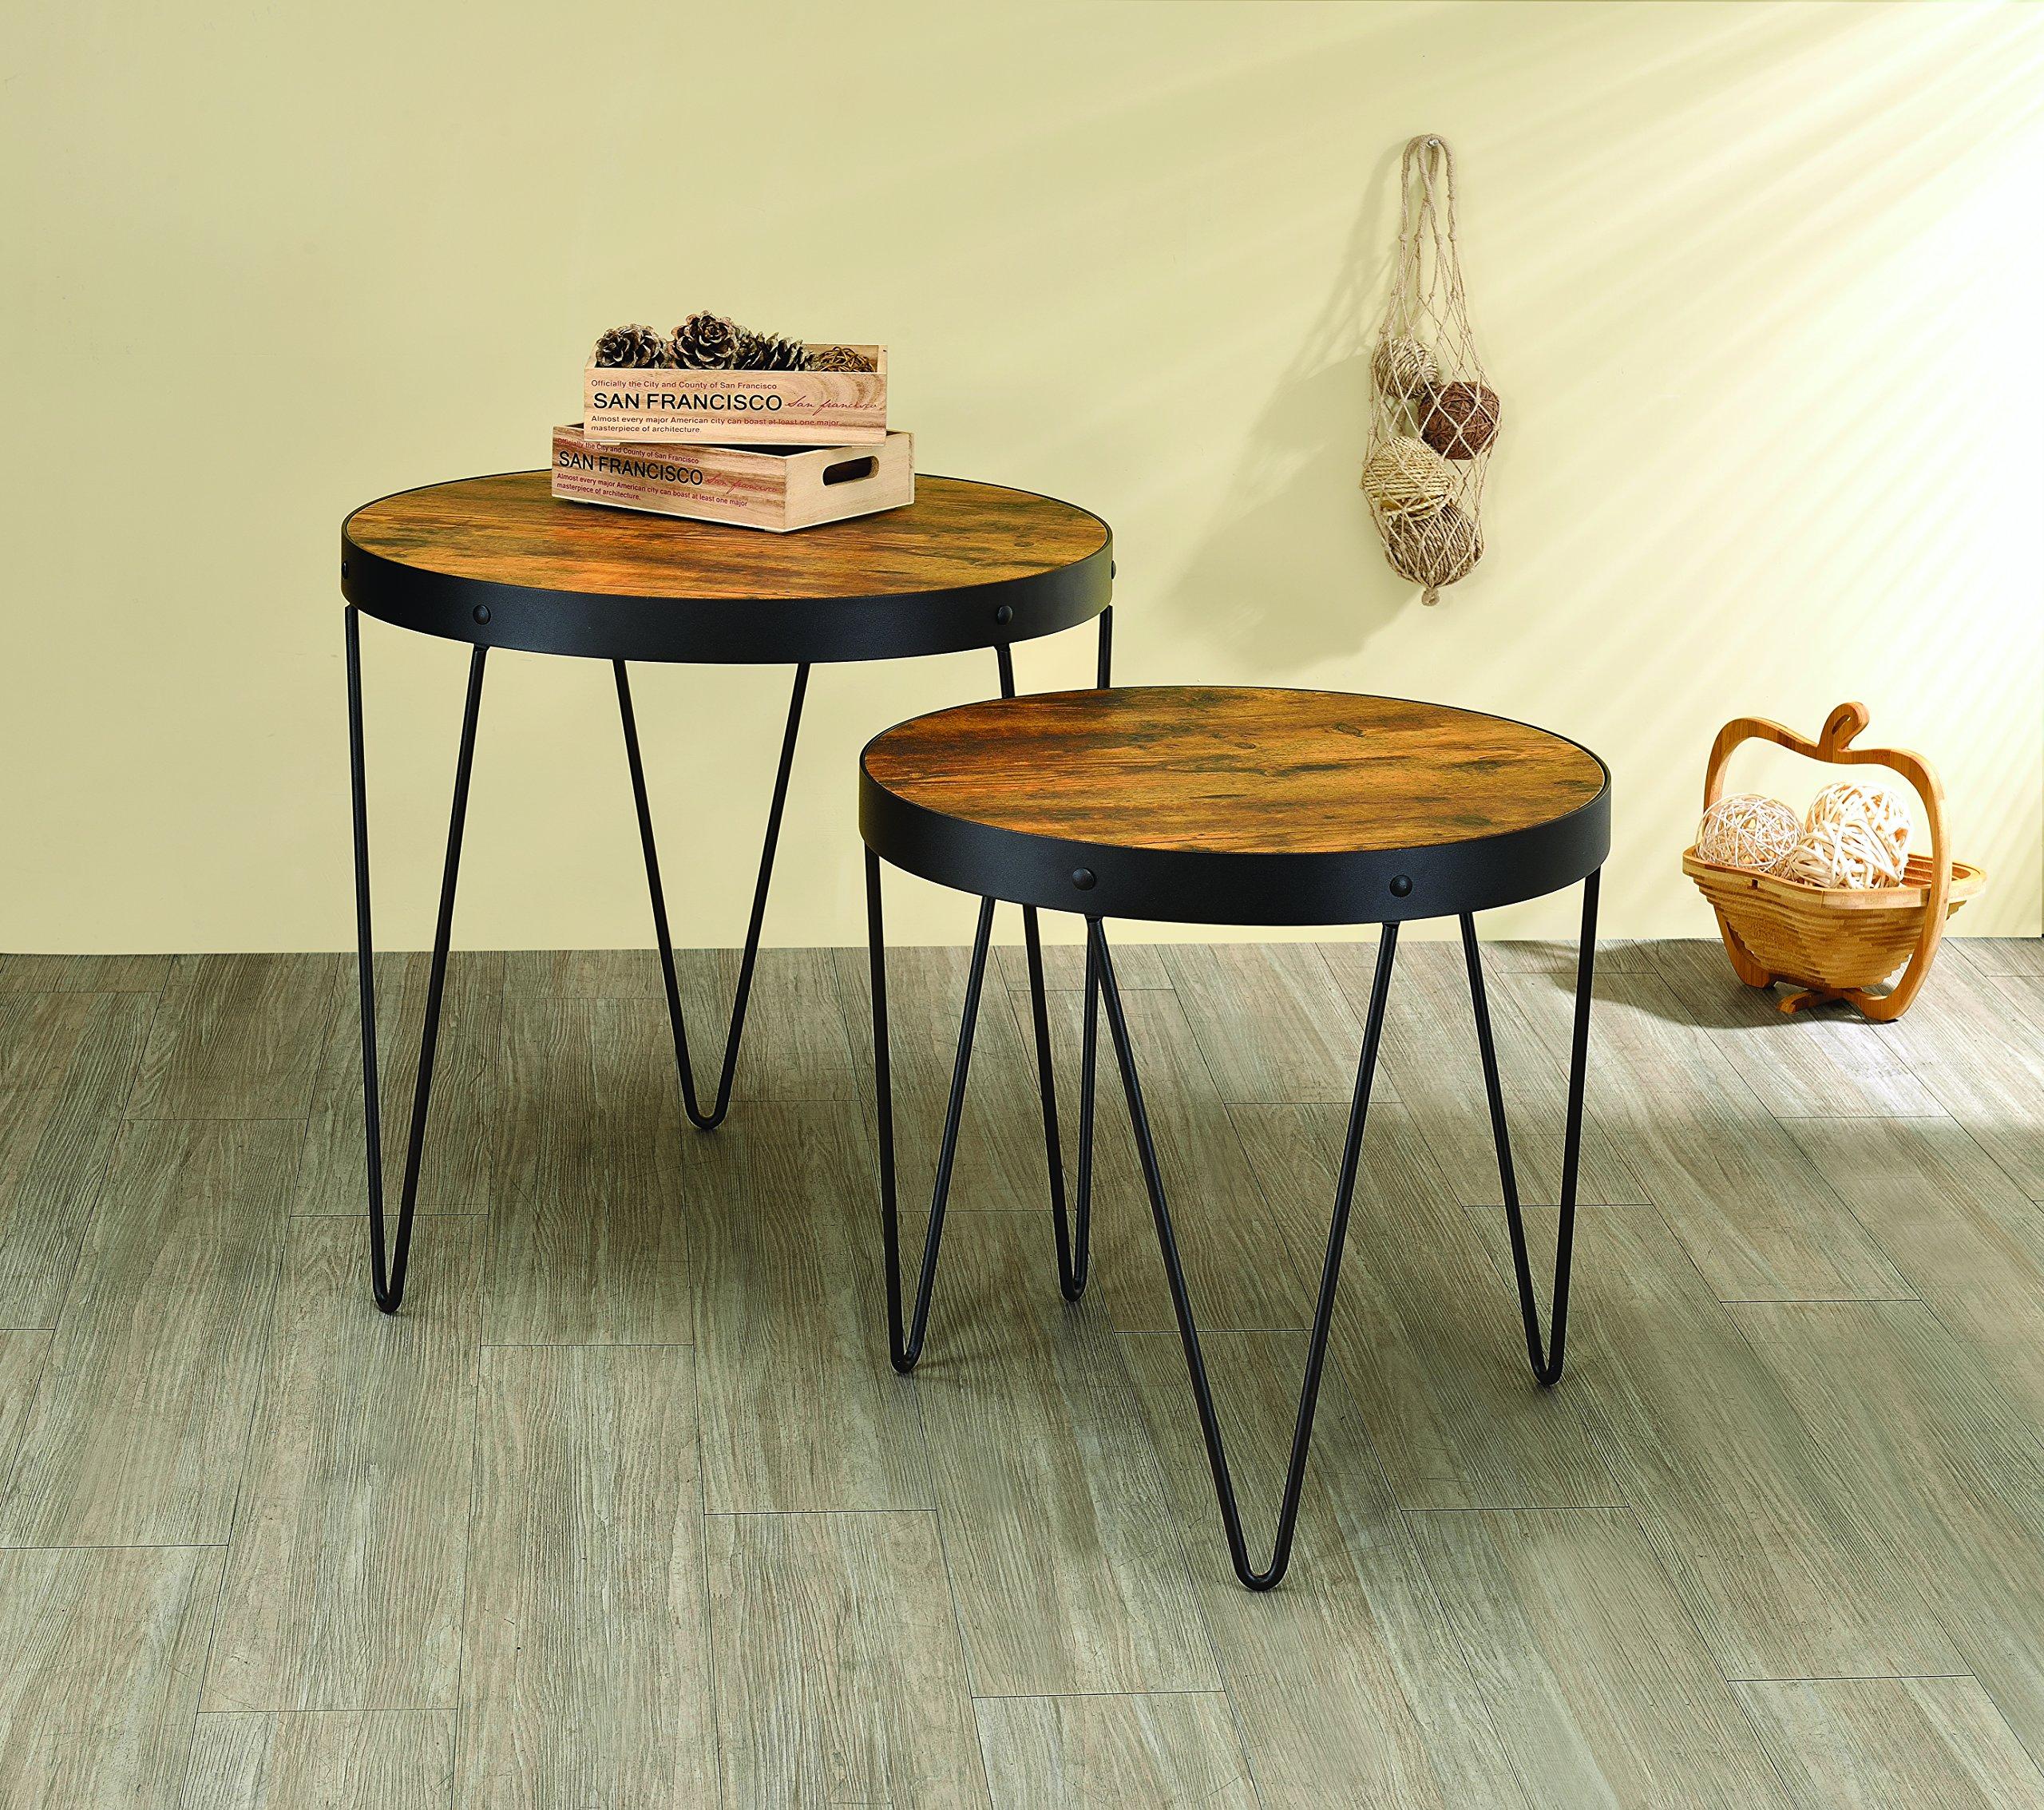 Coaster Home Furnishings Coaster 901944 2Piece Nesting Table Set, Honey Cherry/black